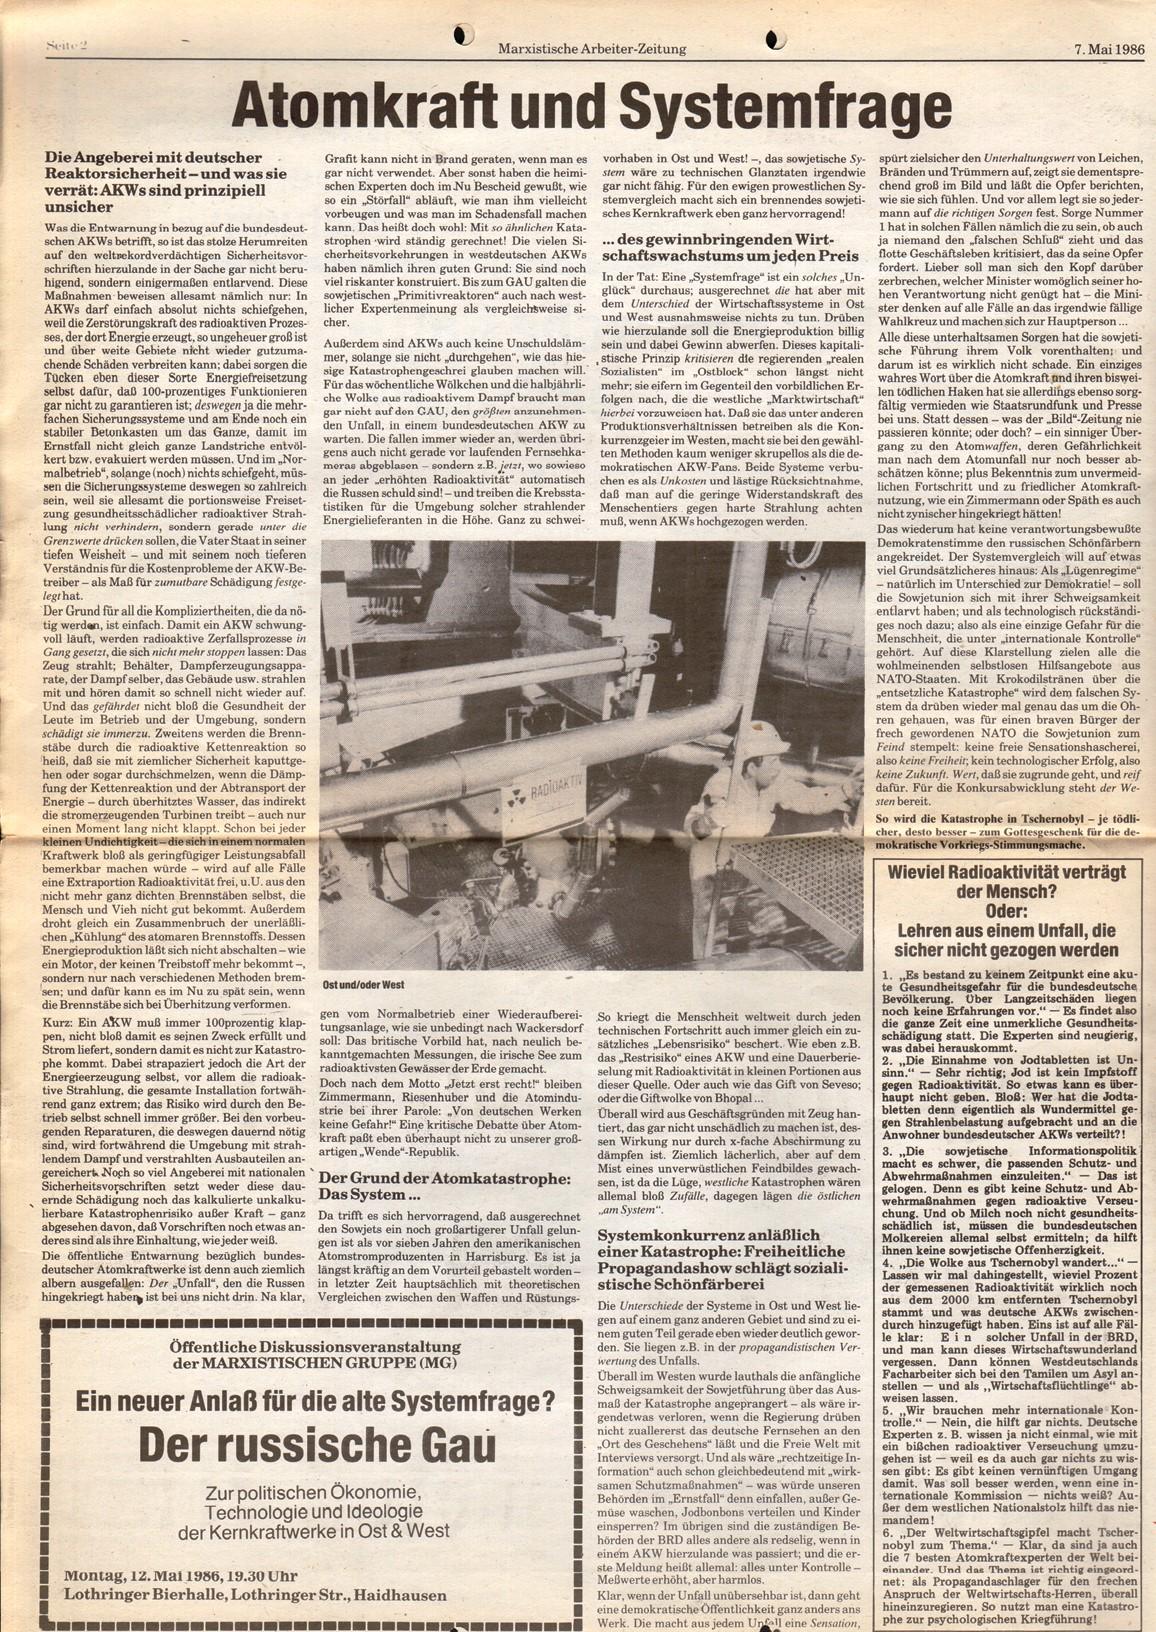 Muenchen_MG_MAZ_Siemens_19860507_02